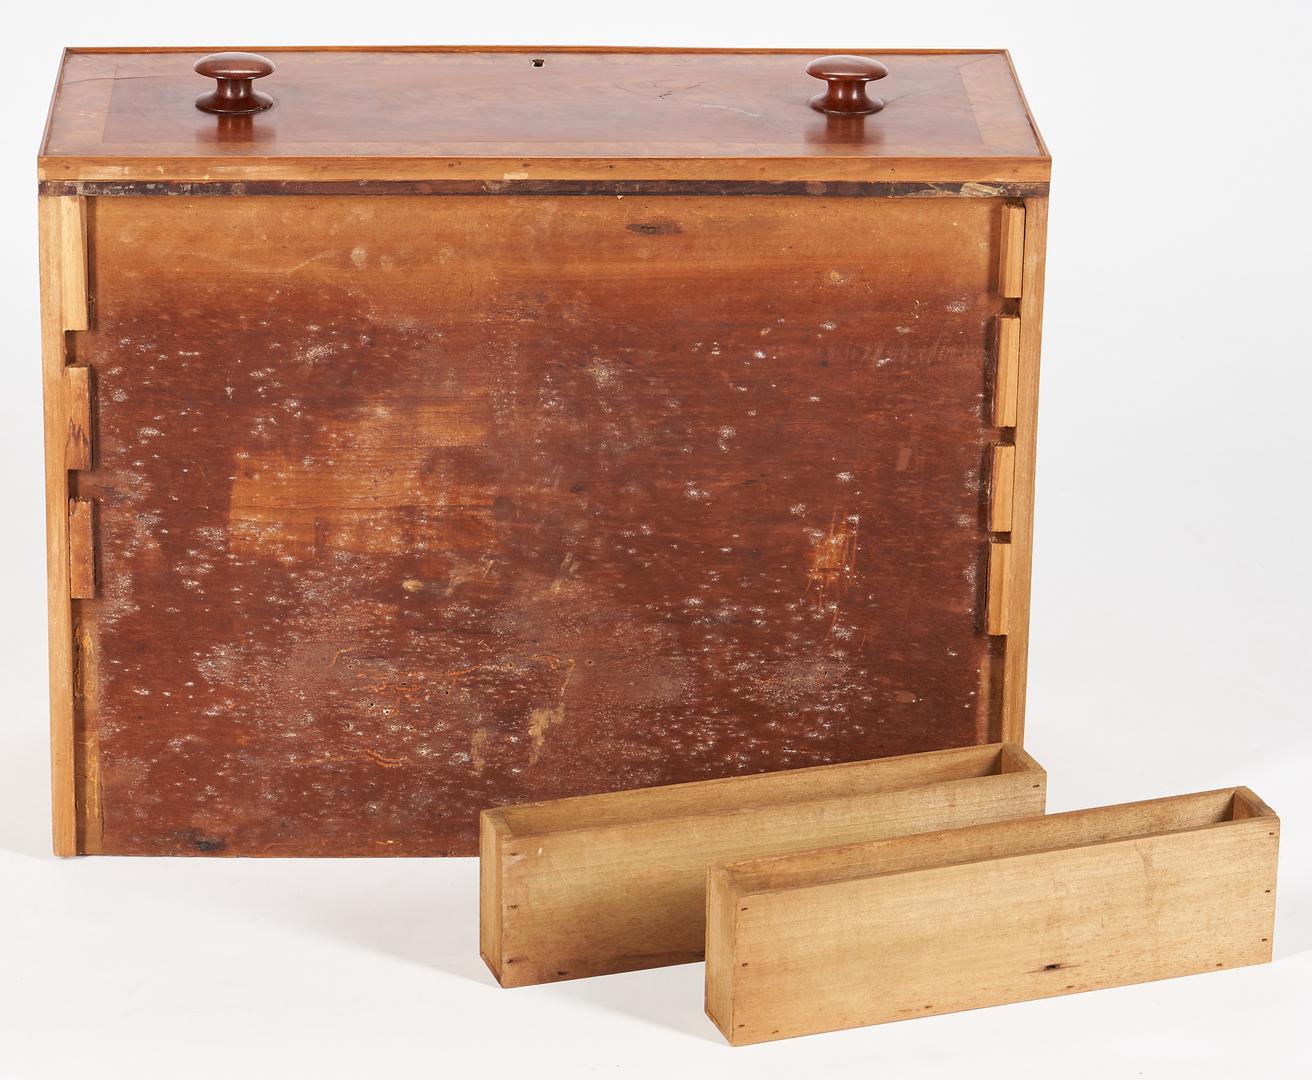 Lot 208: Kentucky Cherry Sugar Table, Hidden Compartments